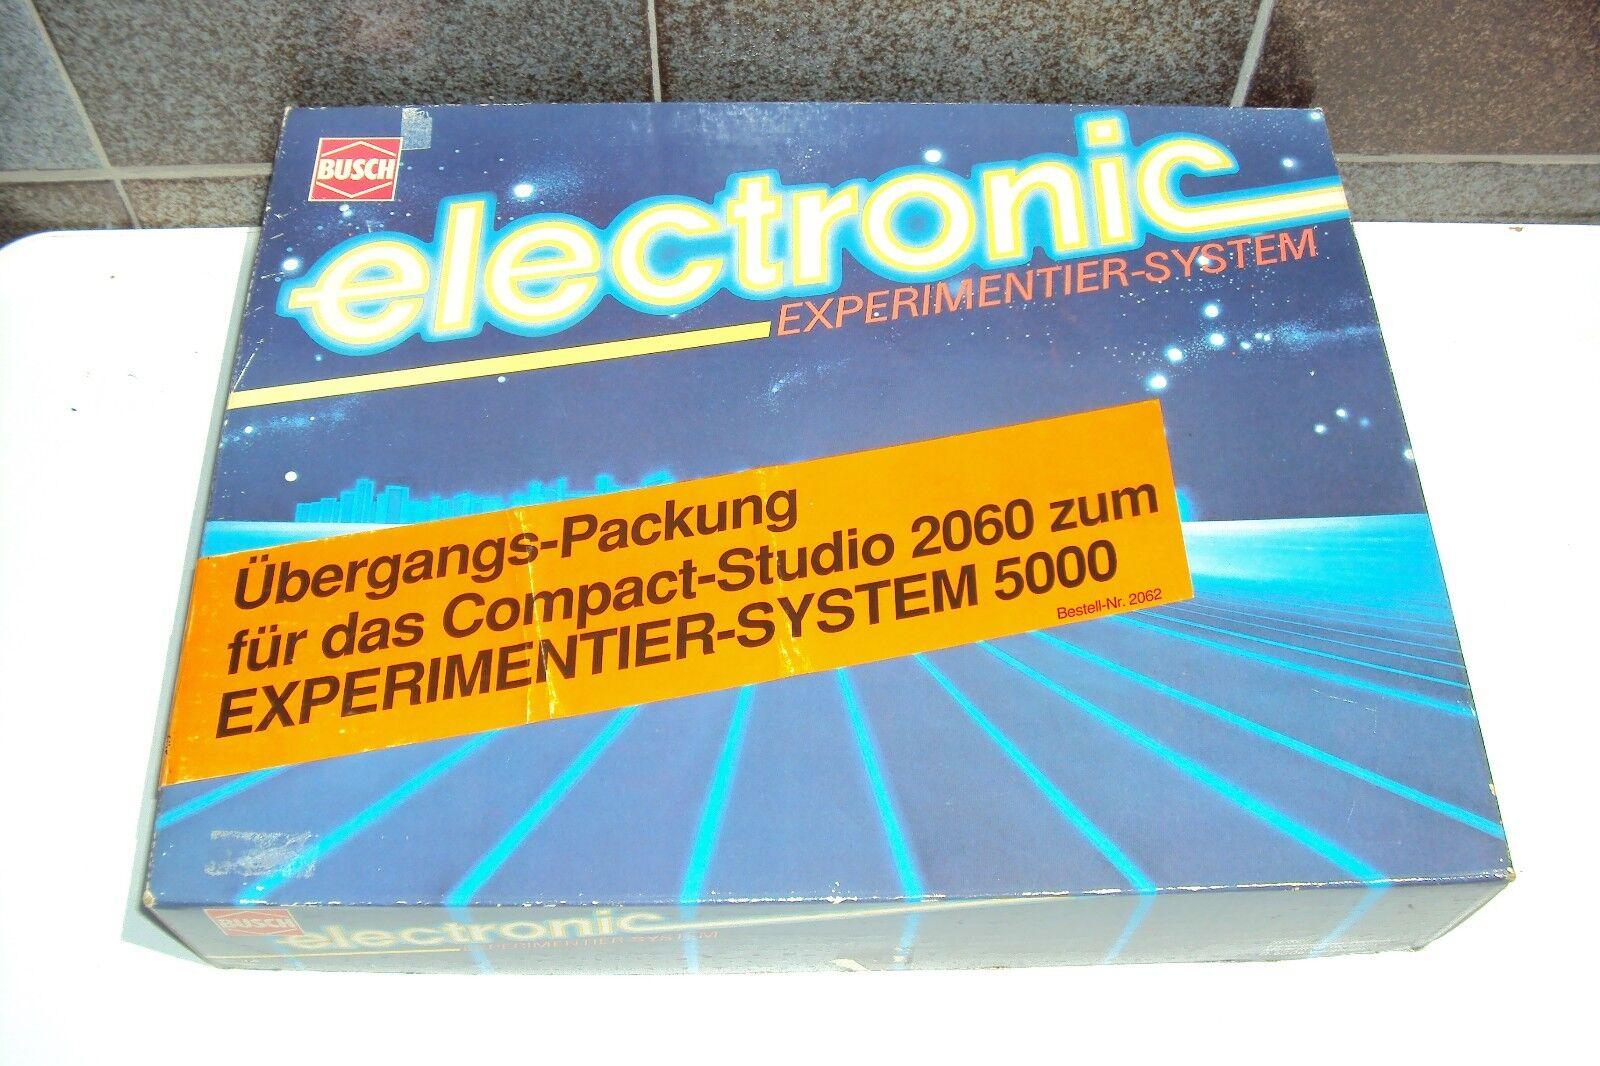 Busch Electronic Erweiterung 2060  Experimentier System 5000 / Bestellnr 2062